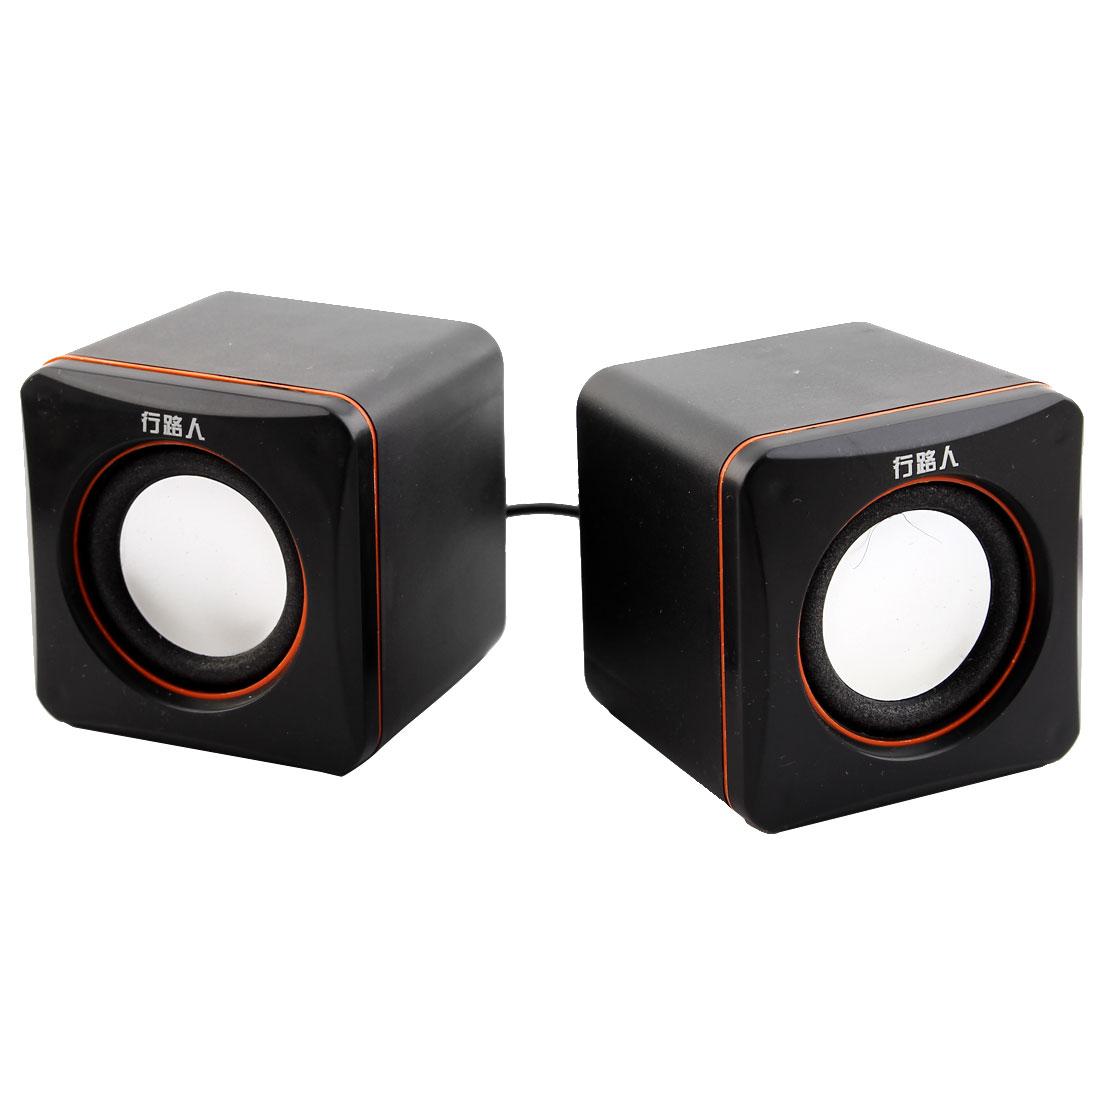 Pair Black Orange Plastic Shell USB Powered Stereo Computer Laptop MP3 MP4 Mini Multimedia Speaker Player Sound Box